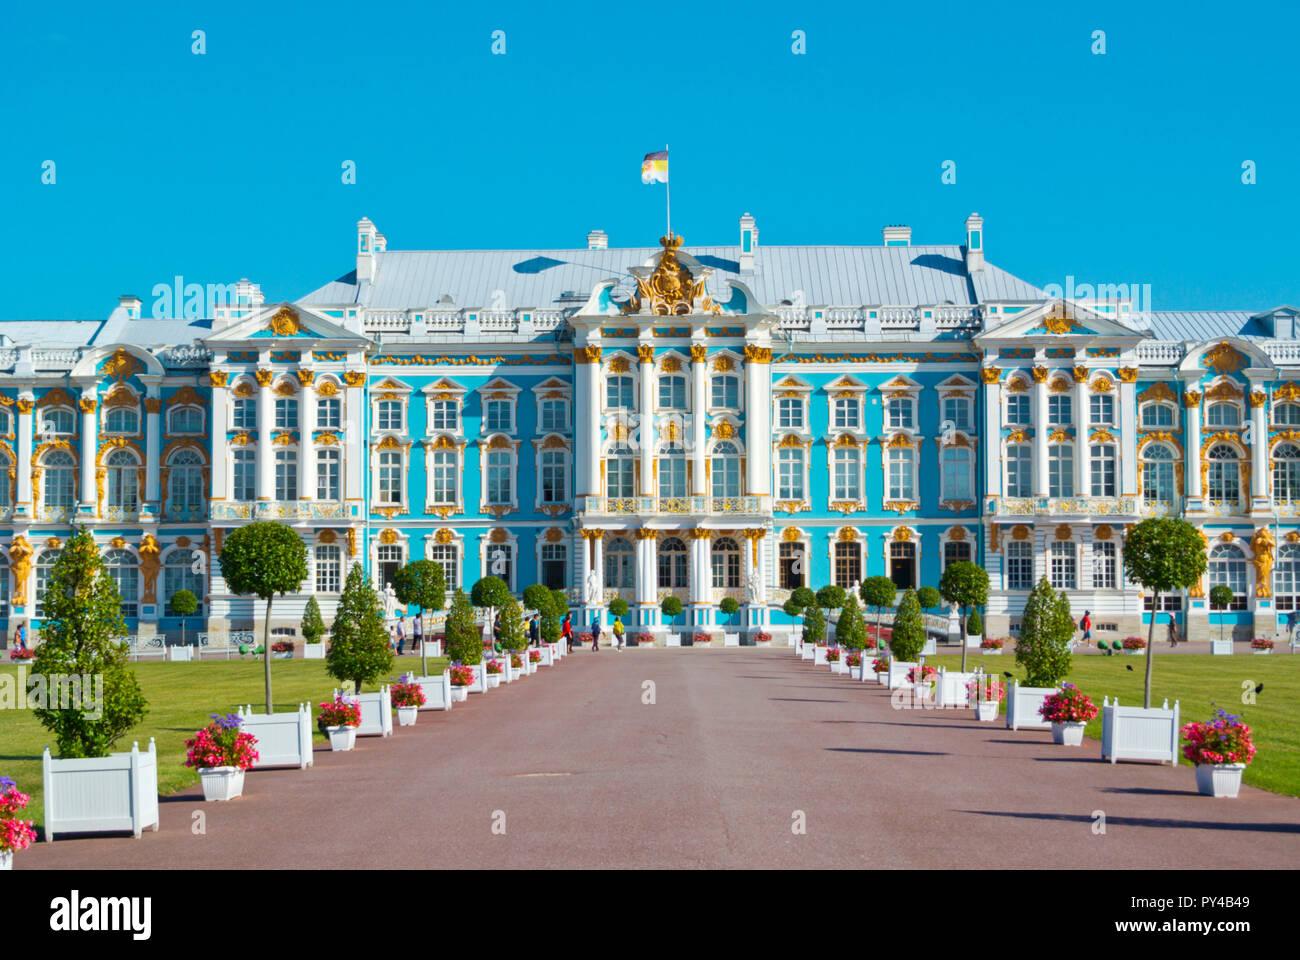 Catharine Palace, from 18th century, Catherine Park, Tsarkoye Selo, near Saint Petersburg, Russia - Stock Image